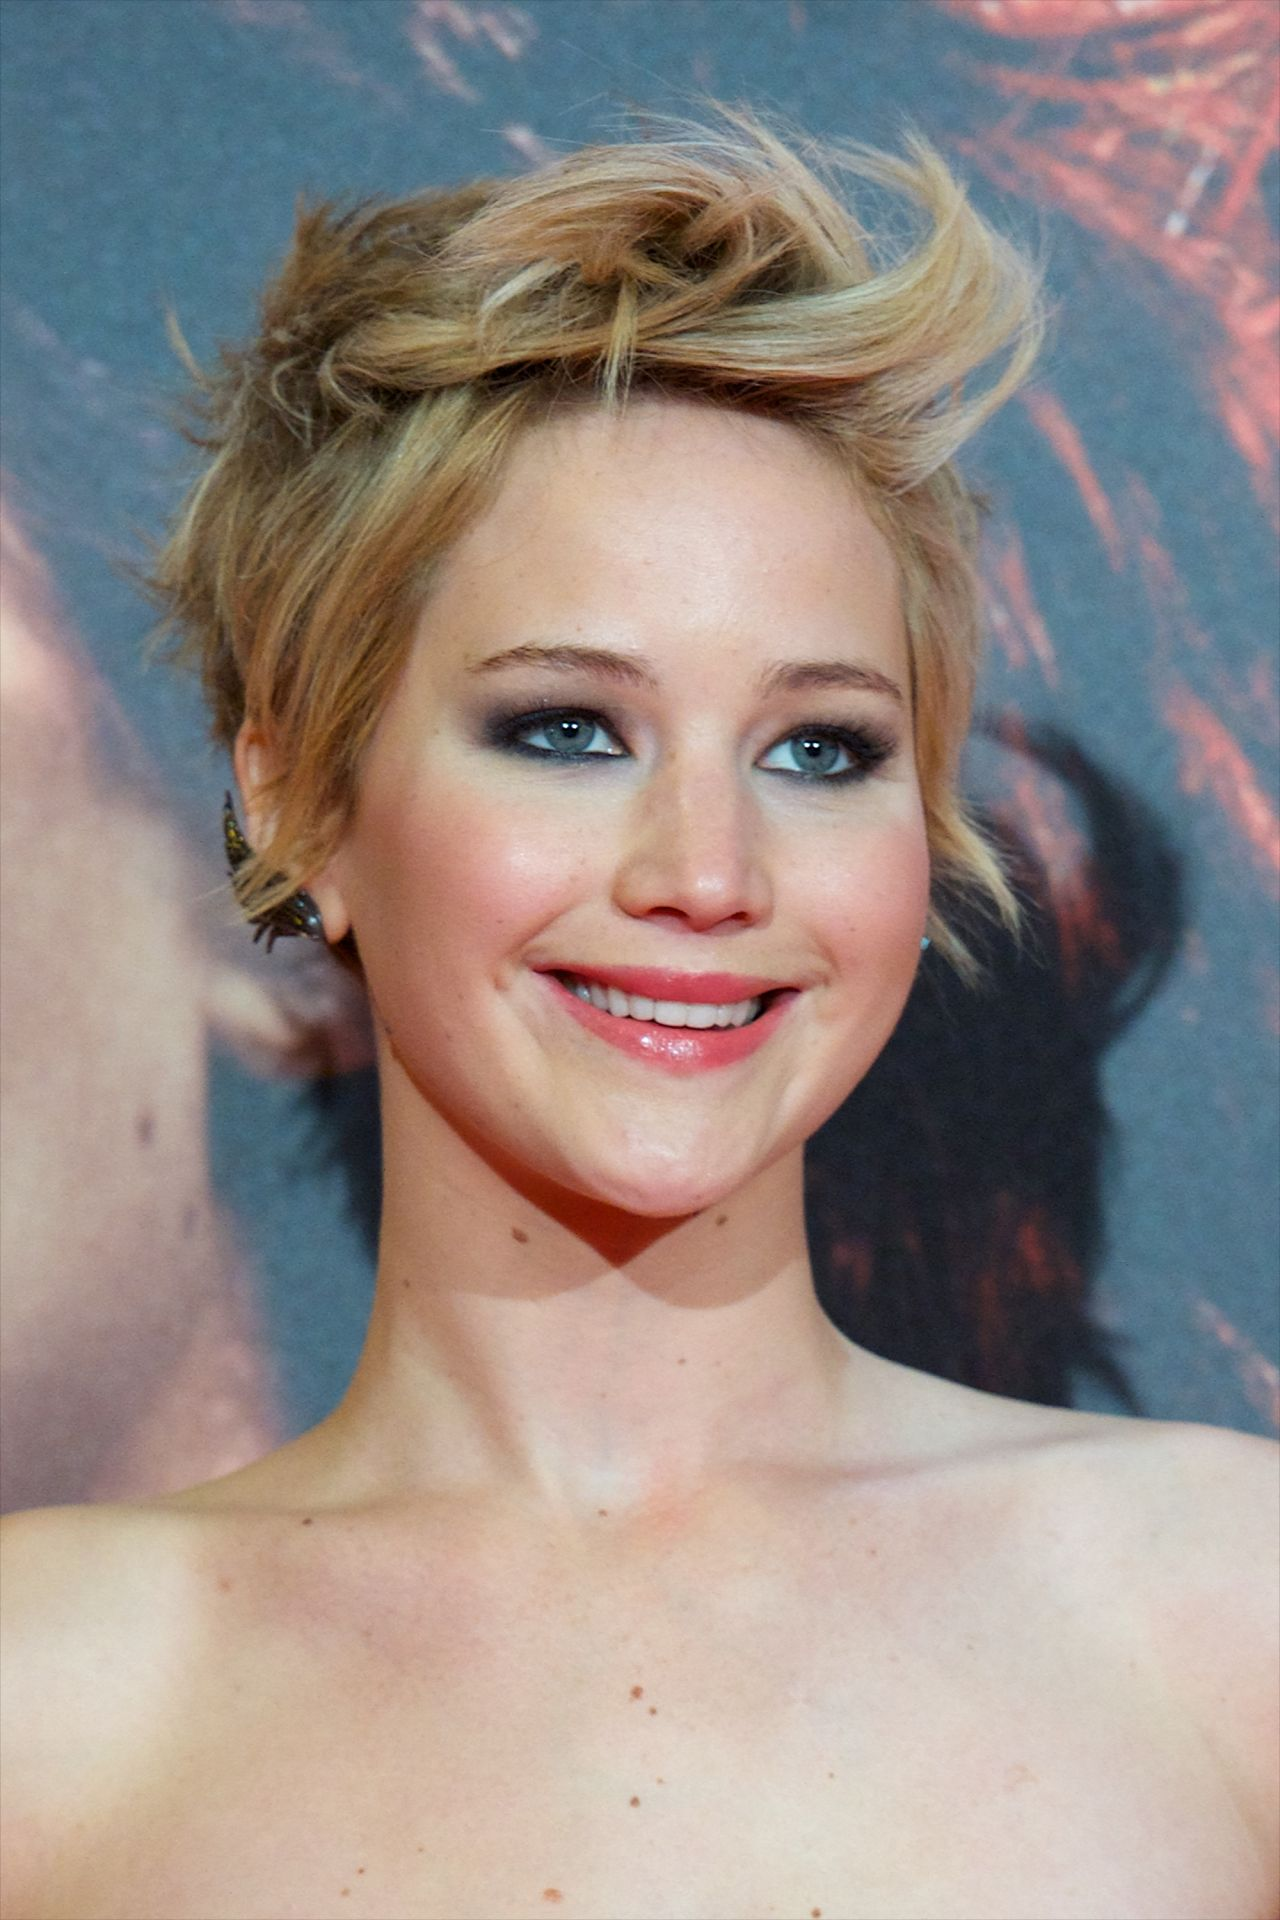 Jennifer Lawrence Red Carpet Photos - THE HUNGER GAMES ...